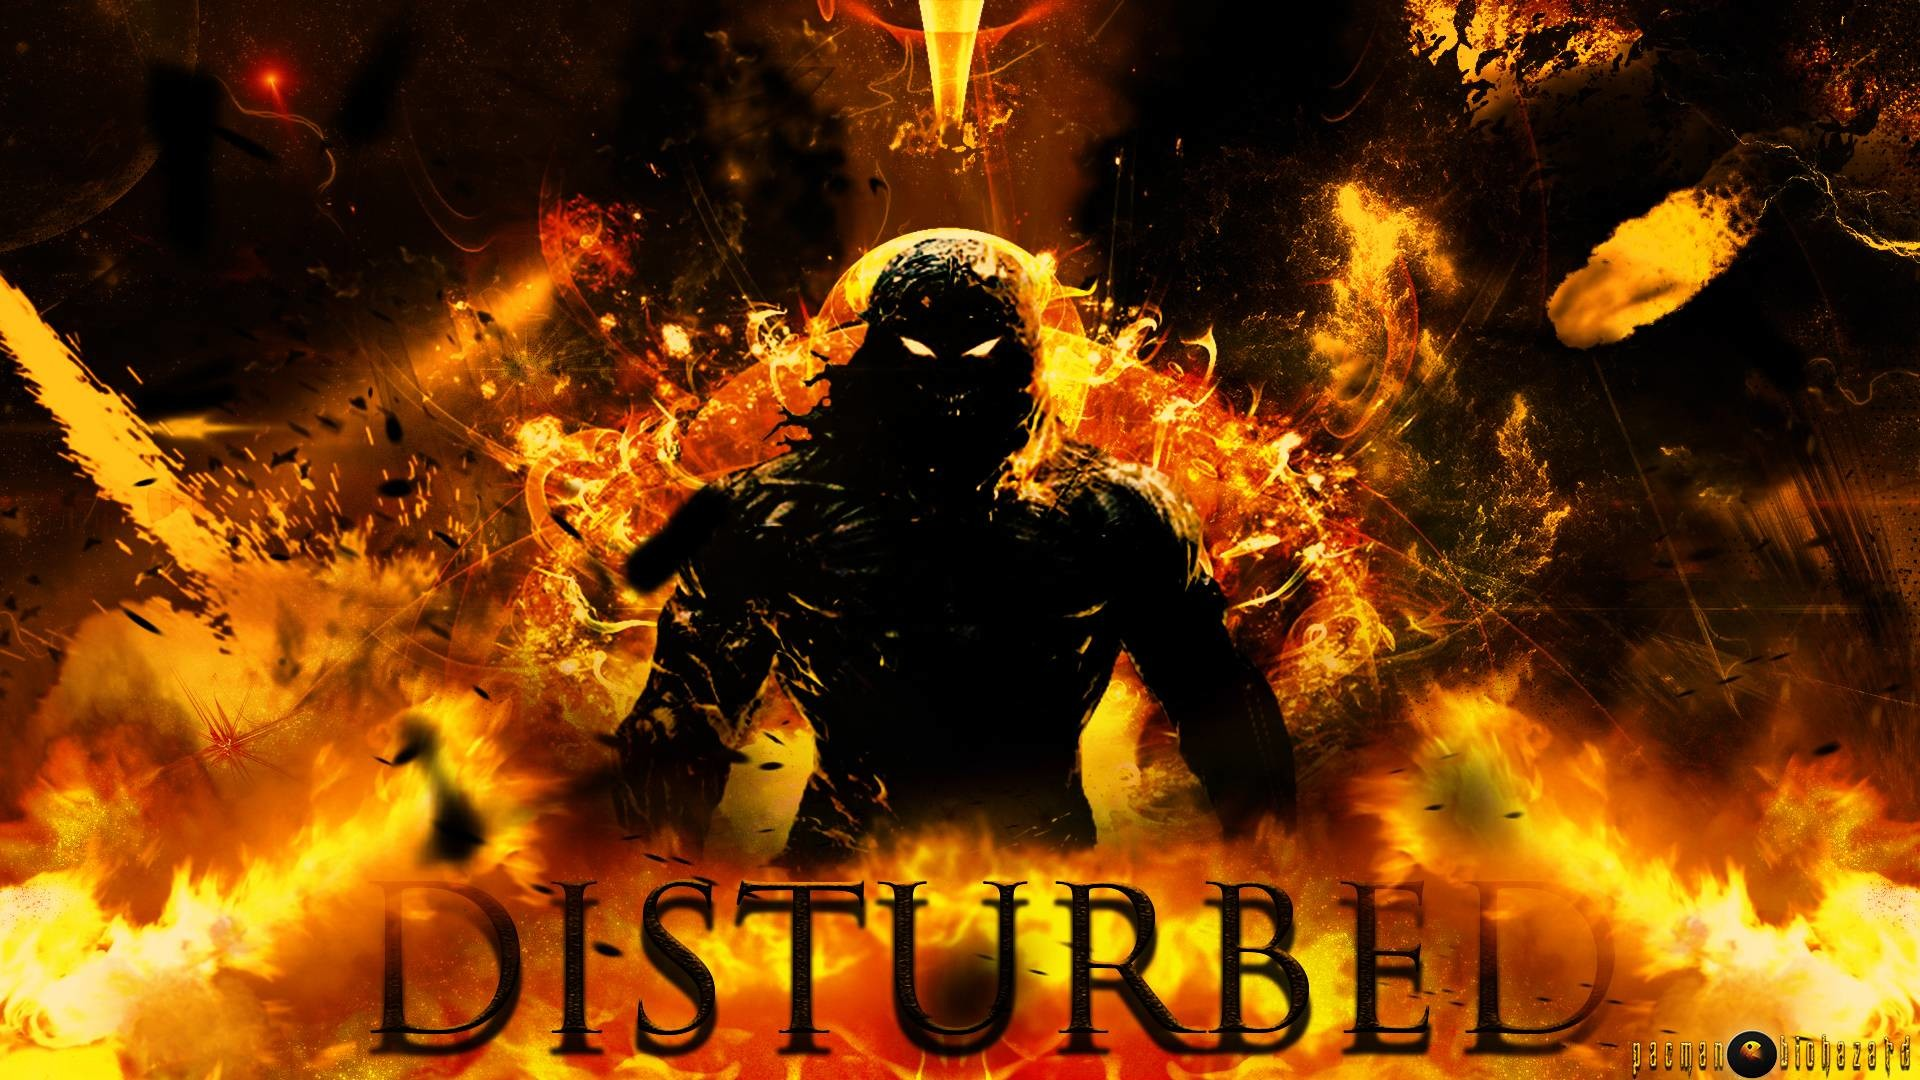 Disturbed (Band) HD Indestructible Background by pacmanbiohazard .